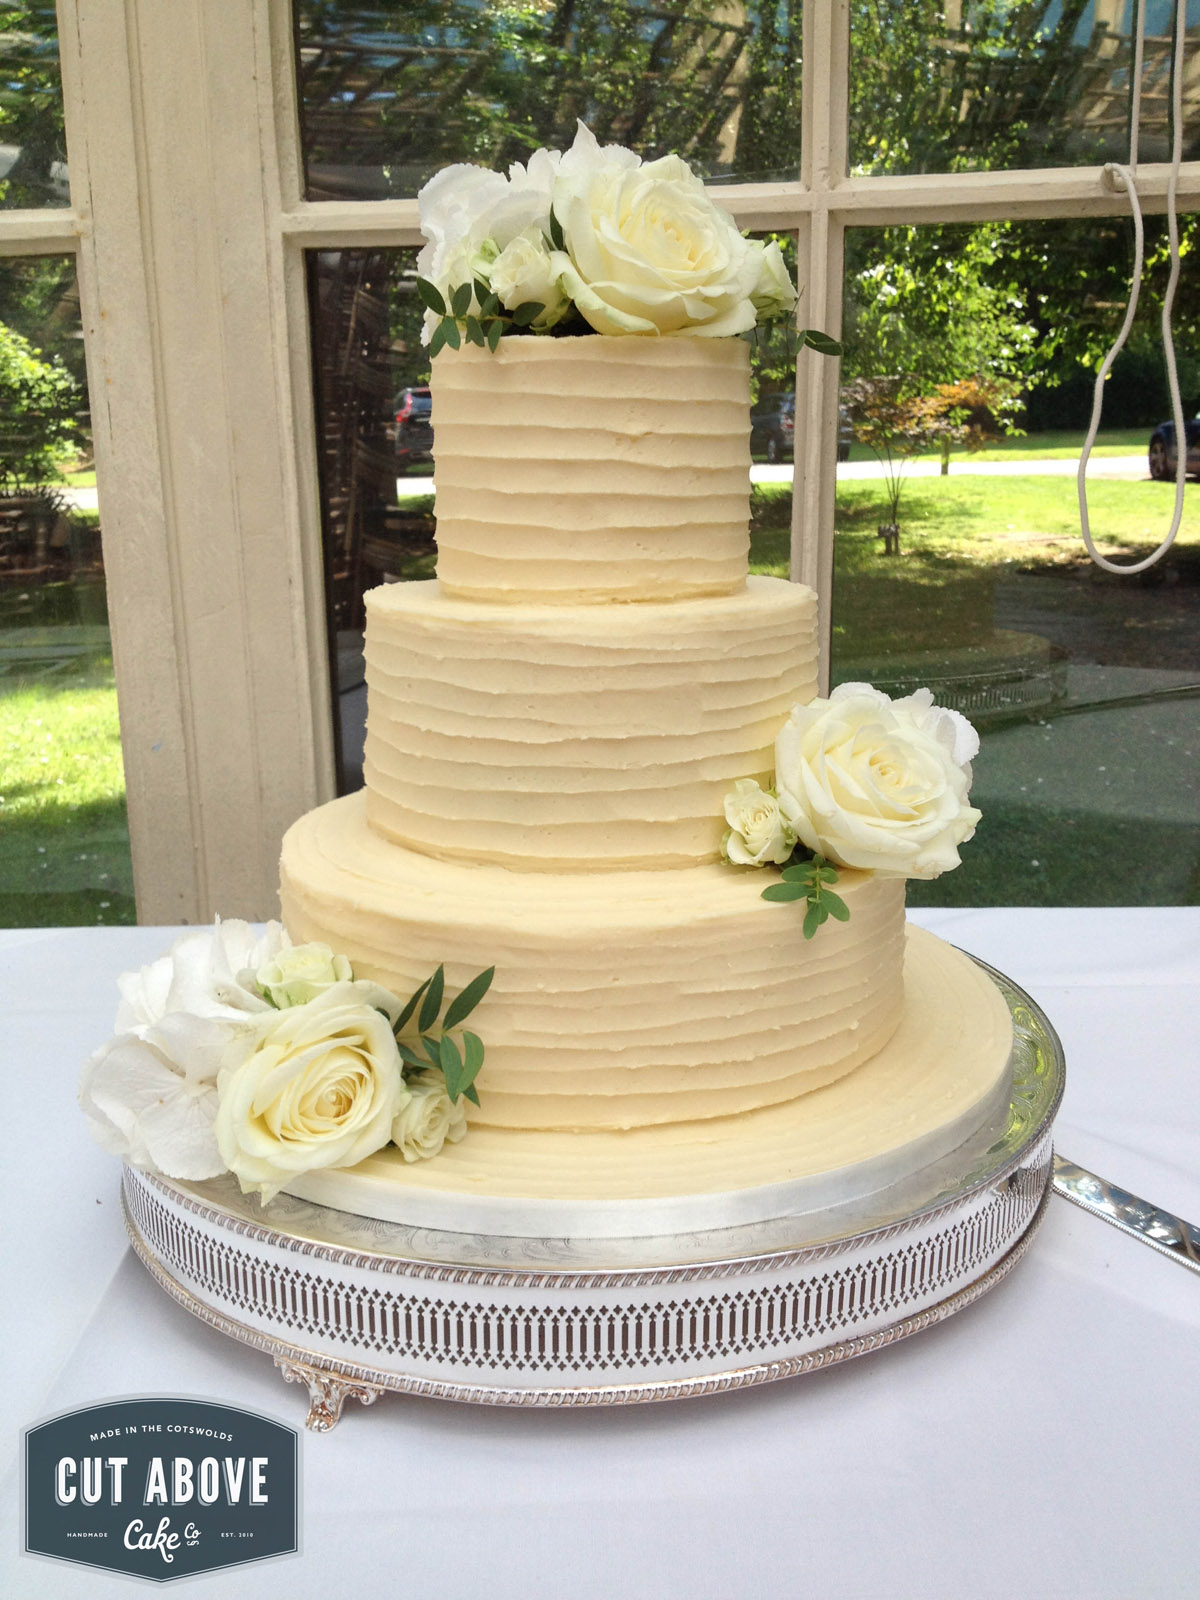 Naked Semi Naked Buttercream Wedding Cakes Cut Above Cake Co